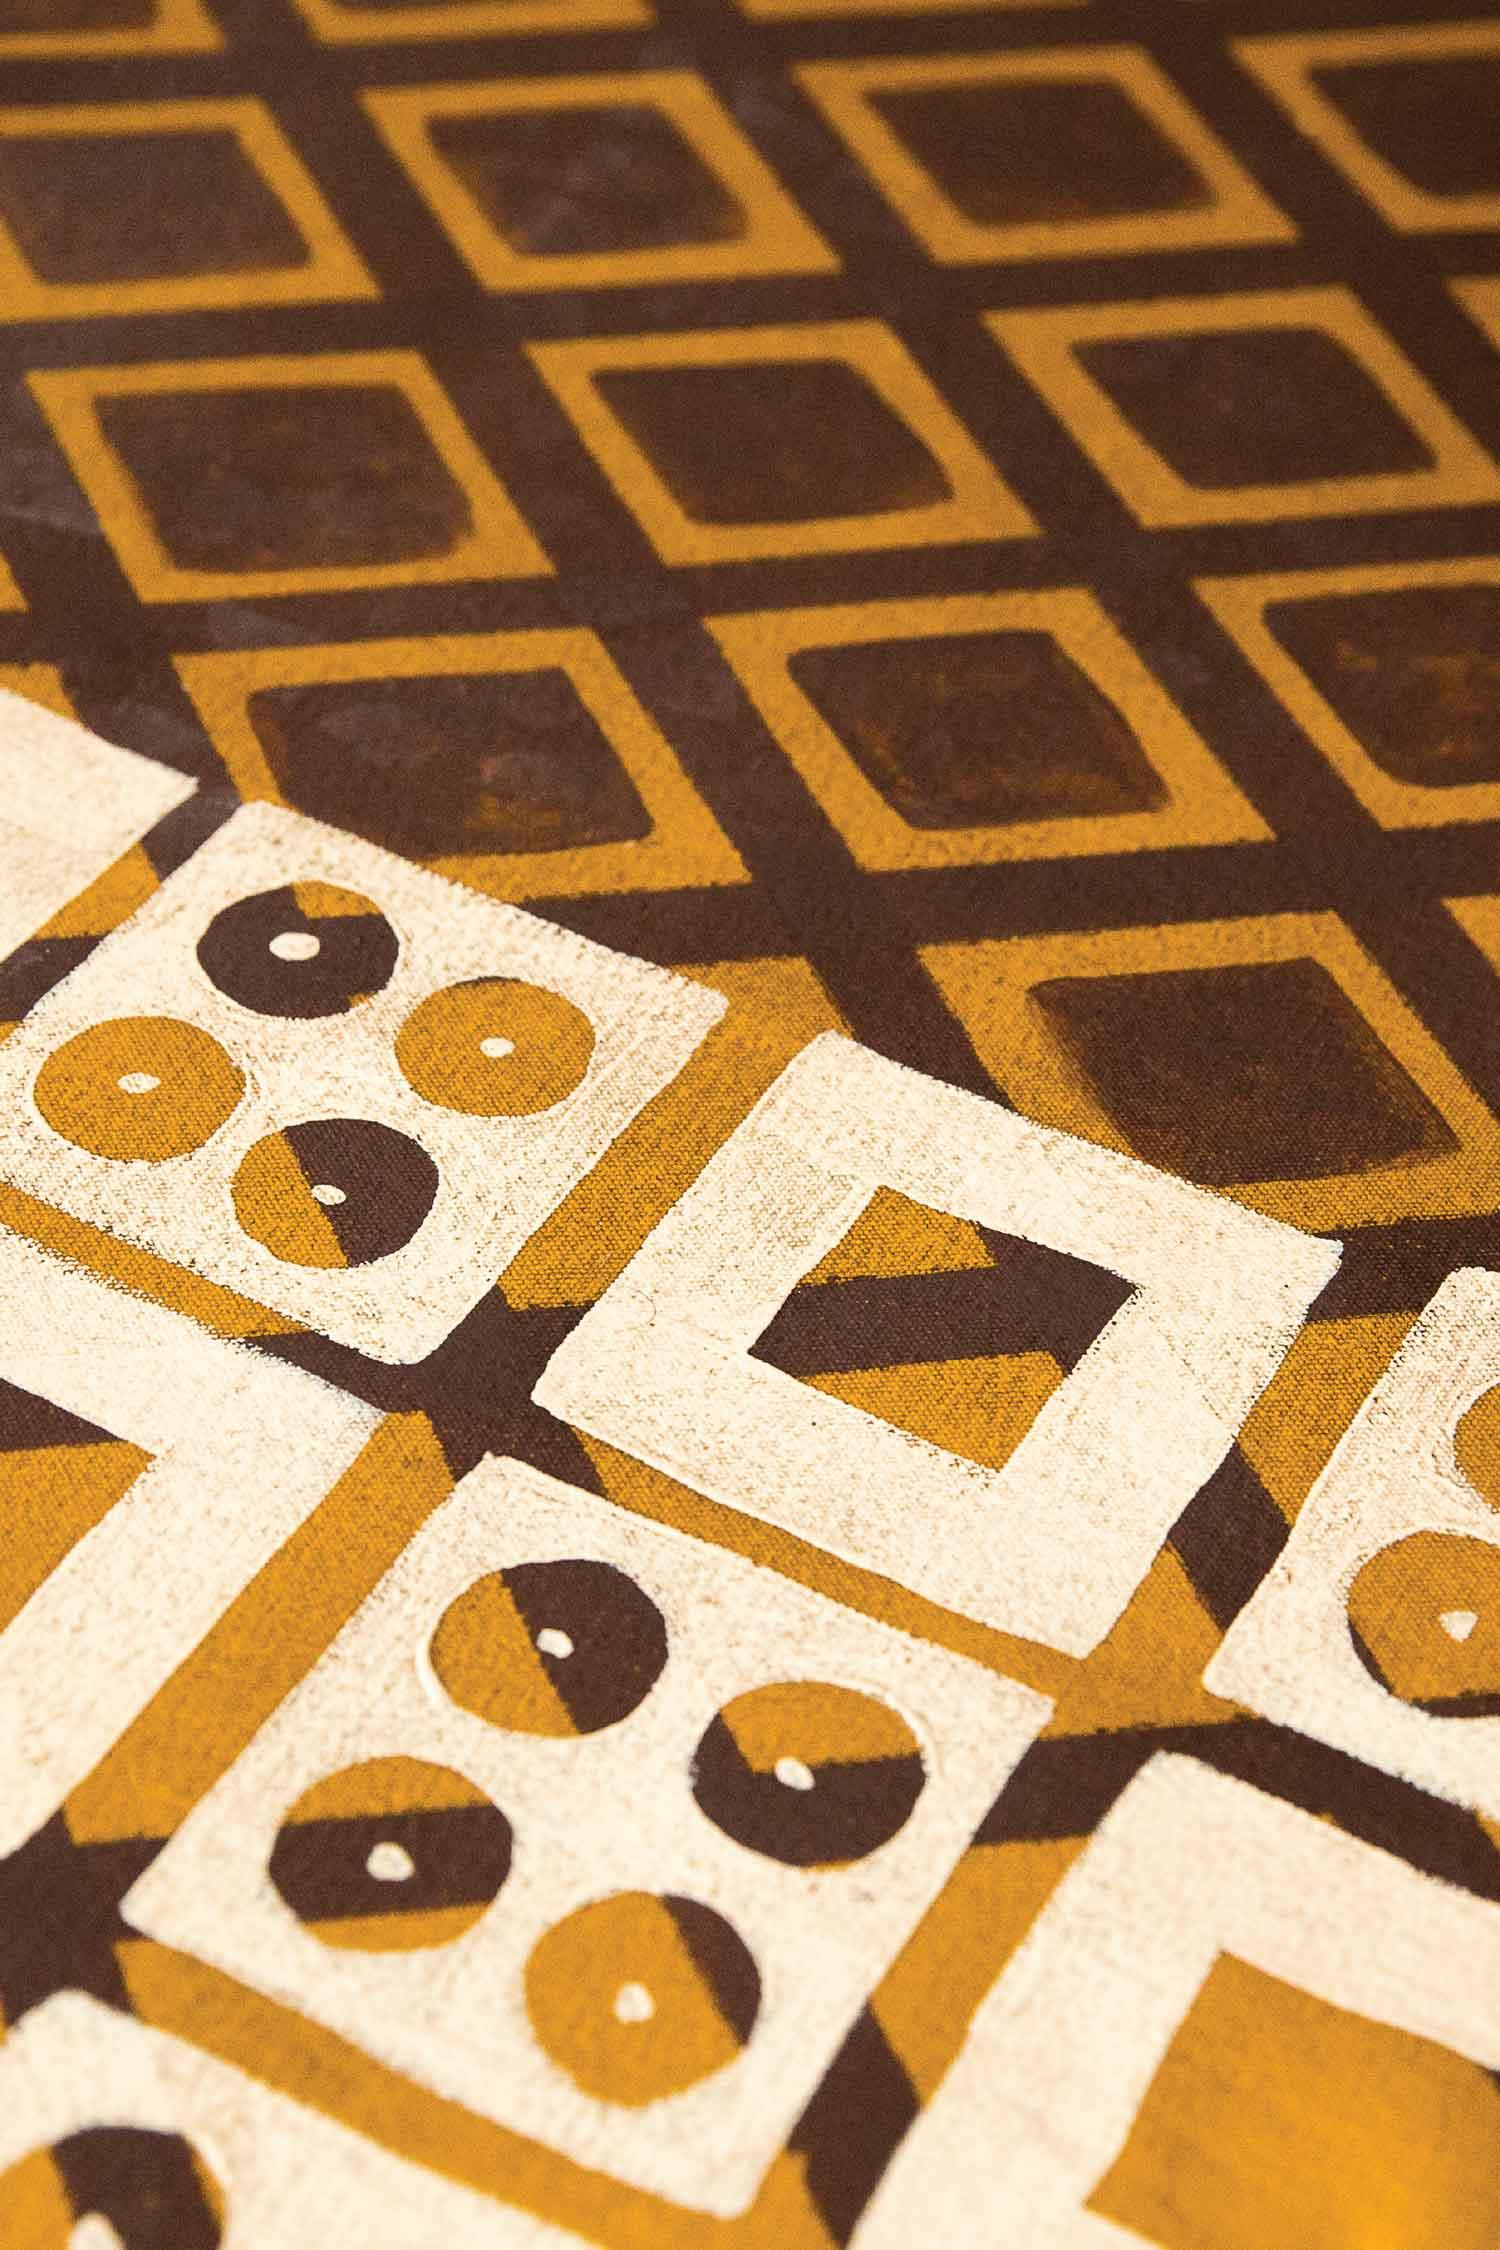 Detail of a historic Mennonite floor pattern.